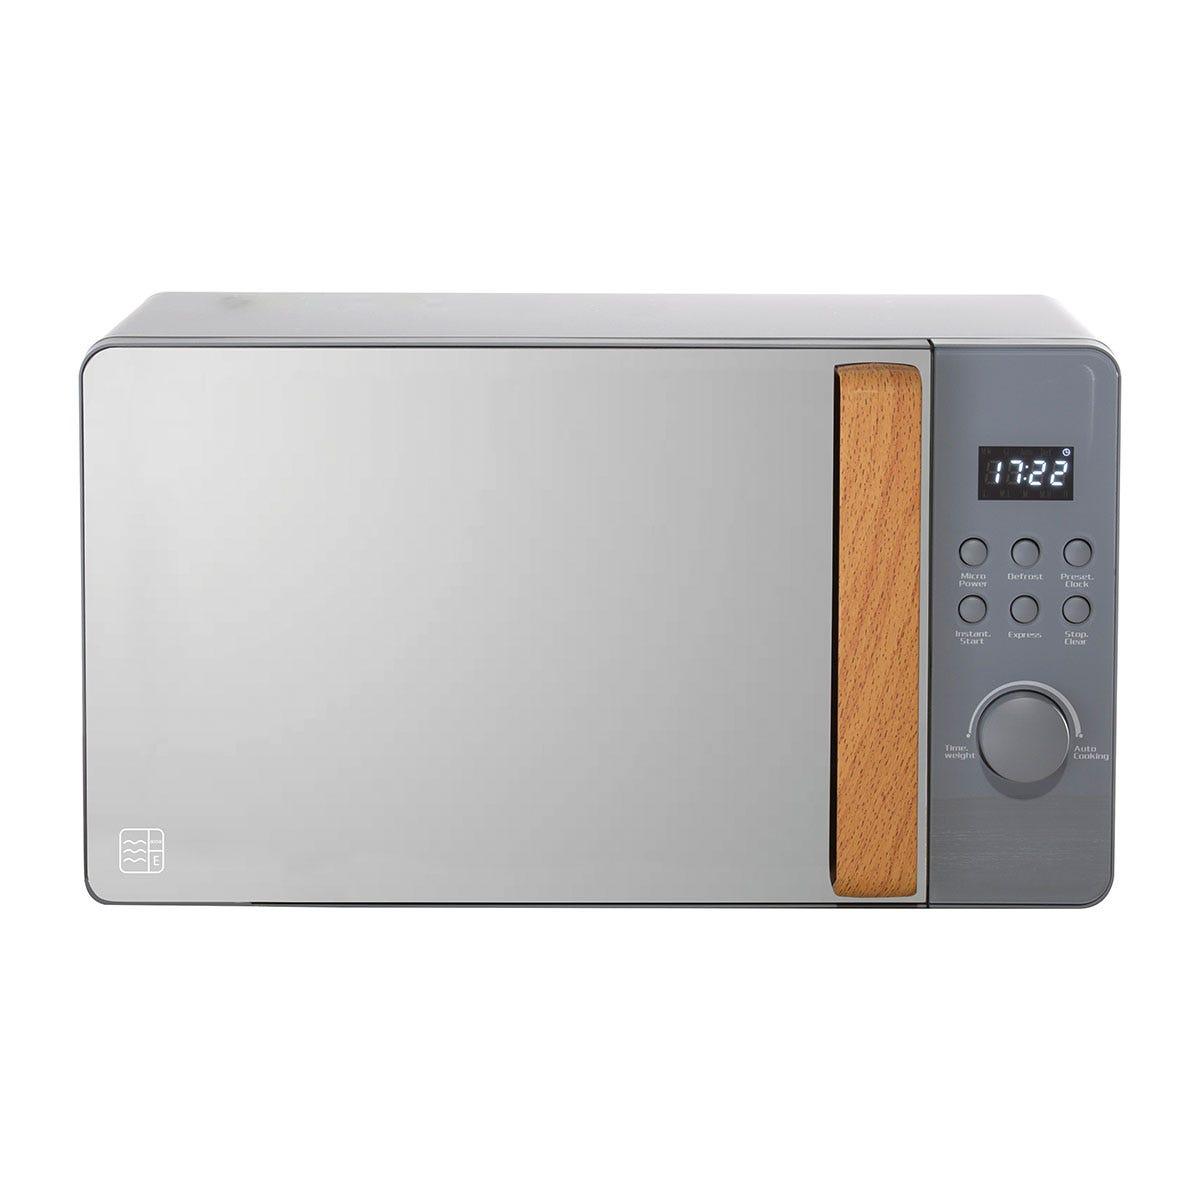 Daewoo SDA1704 Skandik 20L 800W Wooden-Handled Digital Microwave - Grey